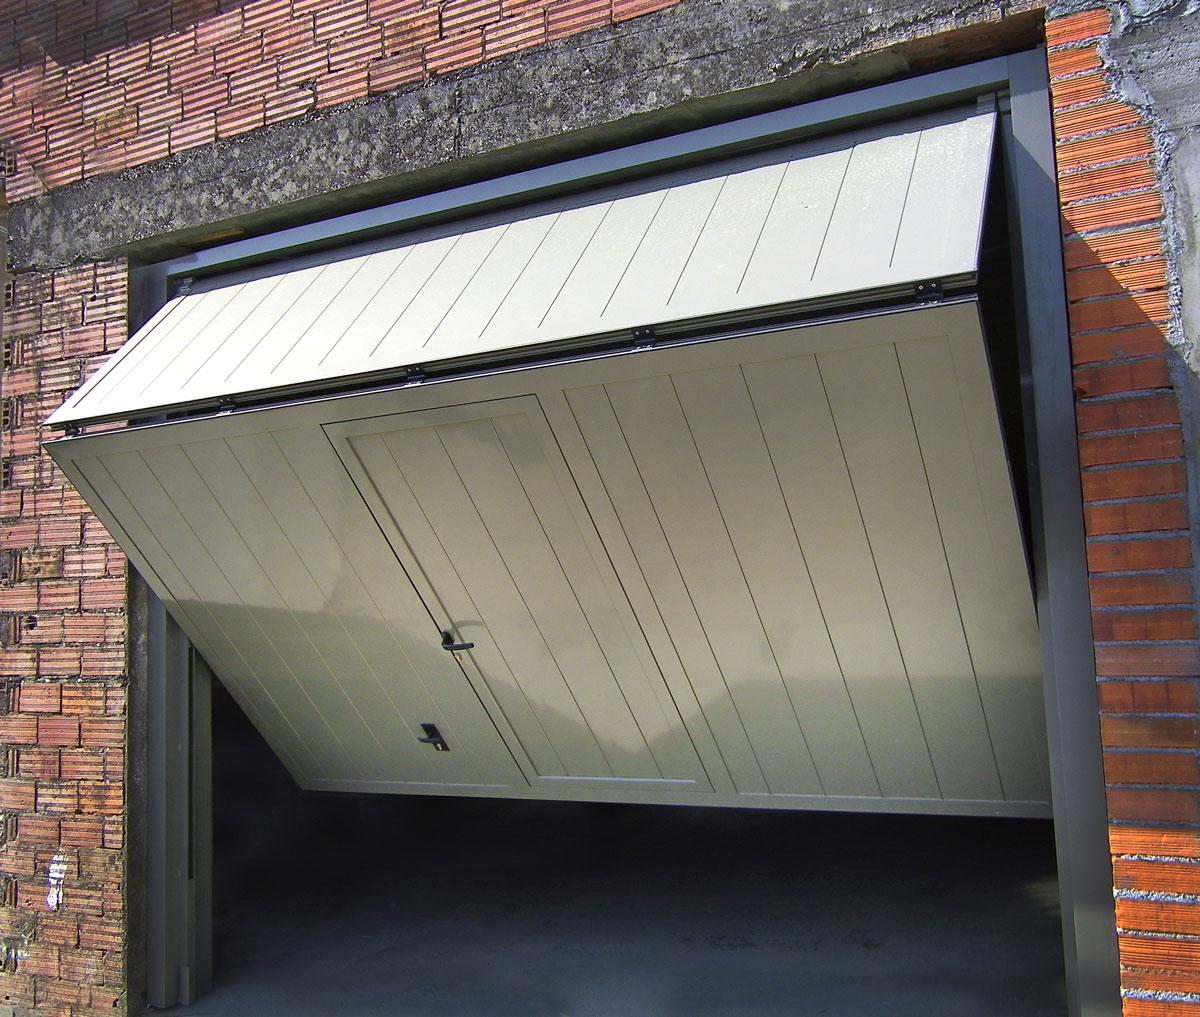 Puertas basculantes de aluminio for Puerta garaje basculante precio